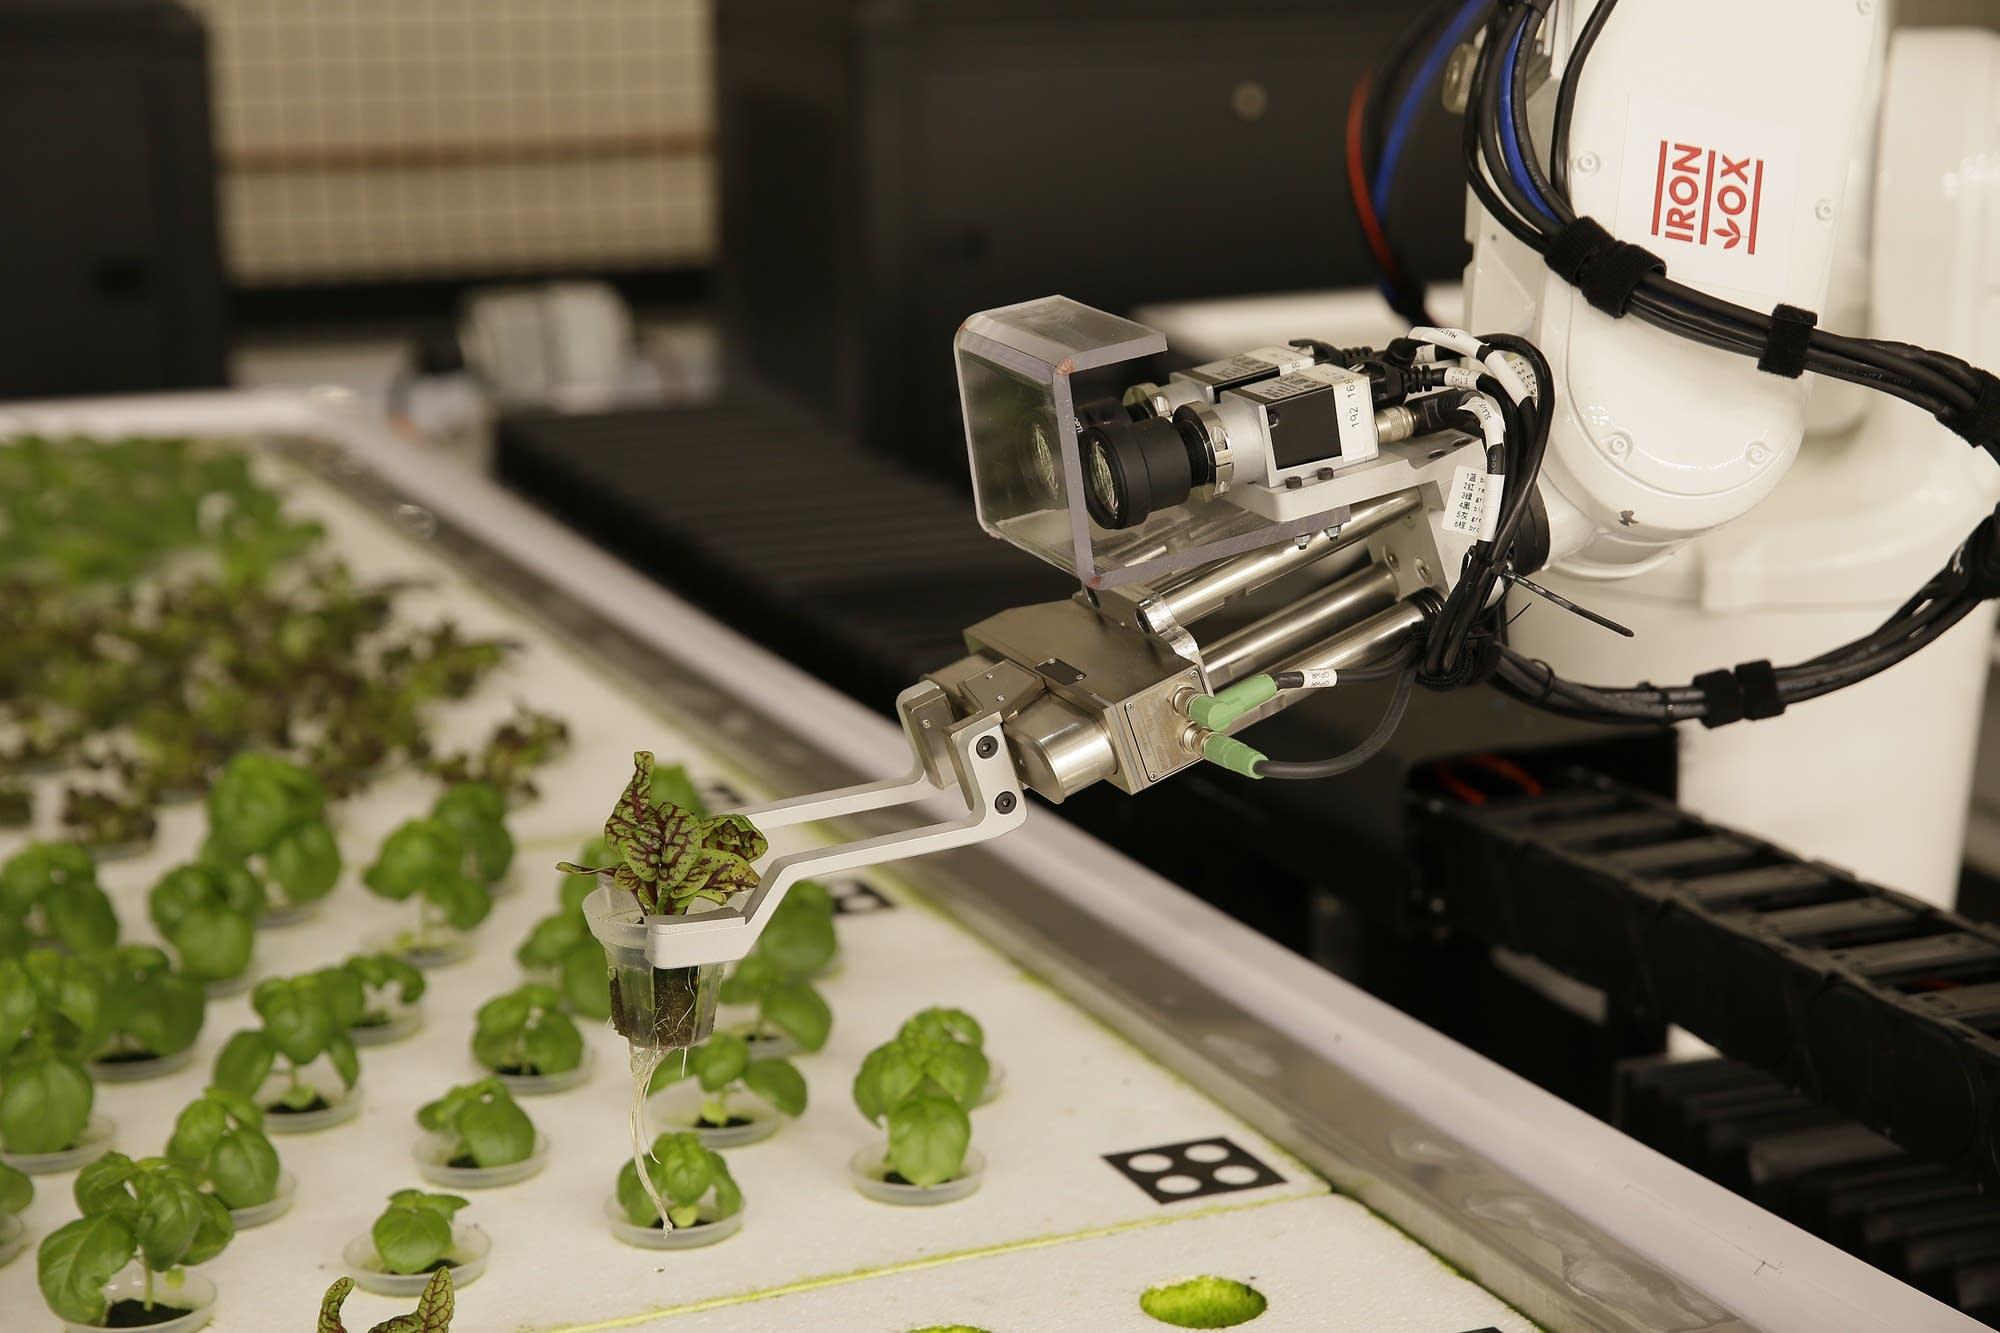 f1b401-20181003-robot-farmers02_1538577486547.jpg